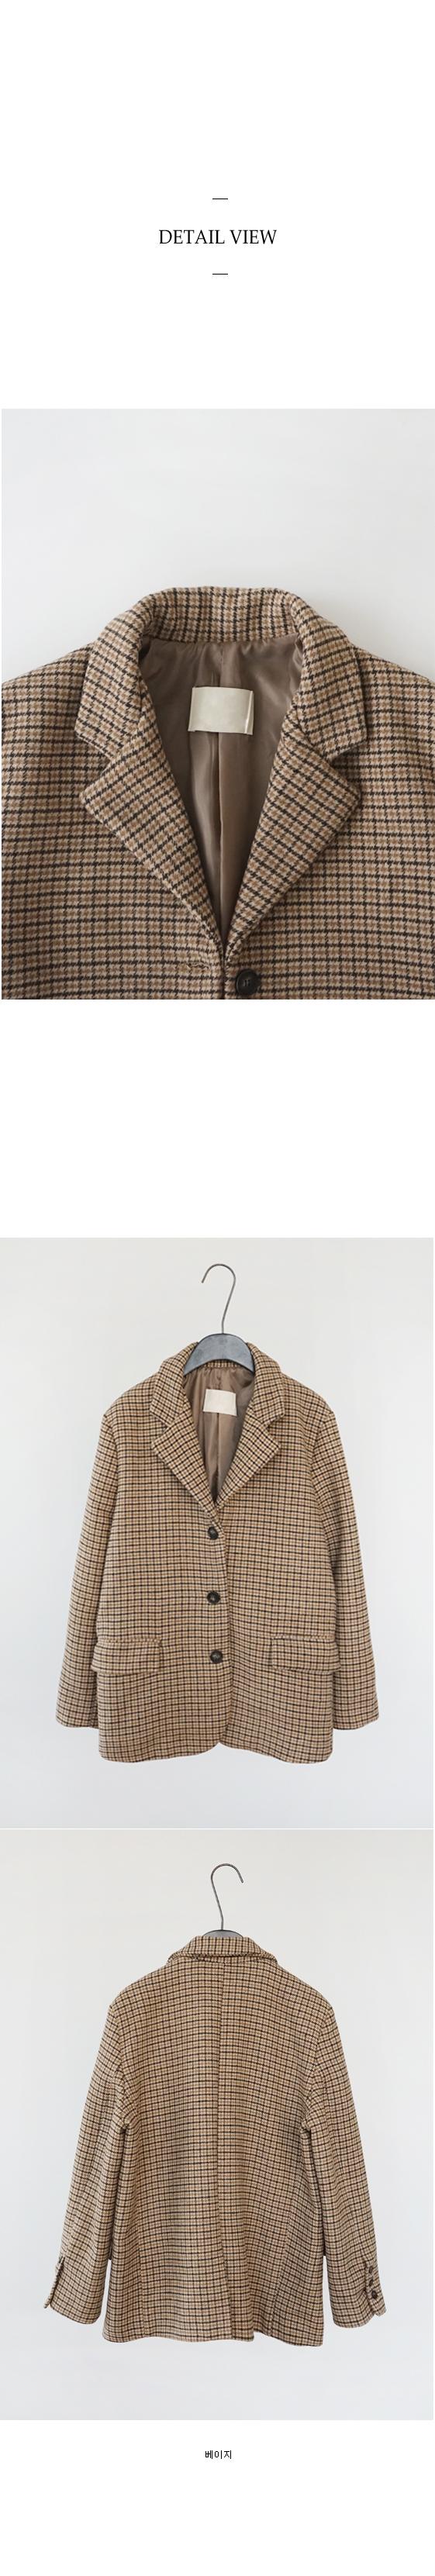 beige houndtooth jacket